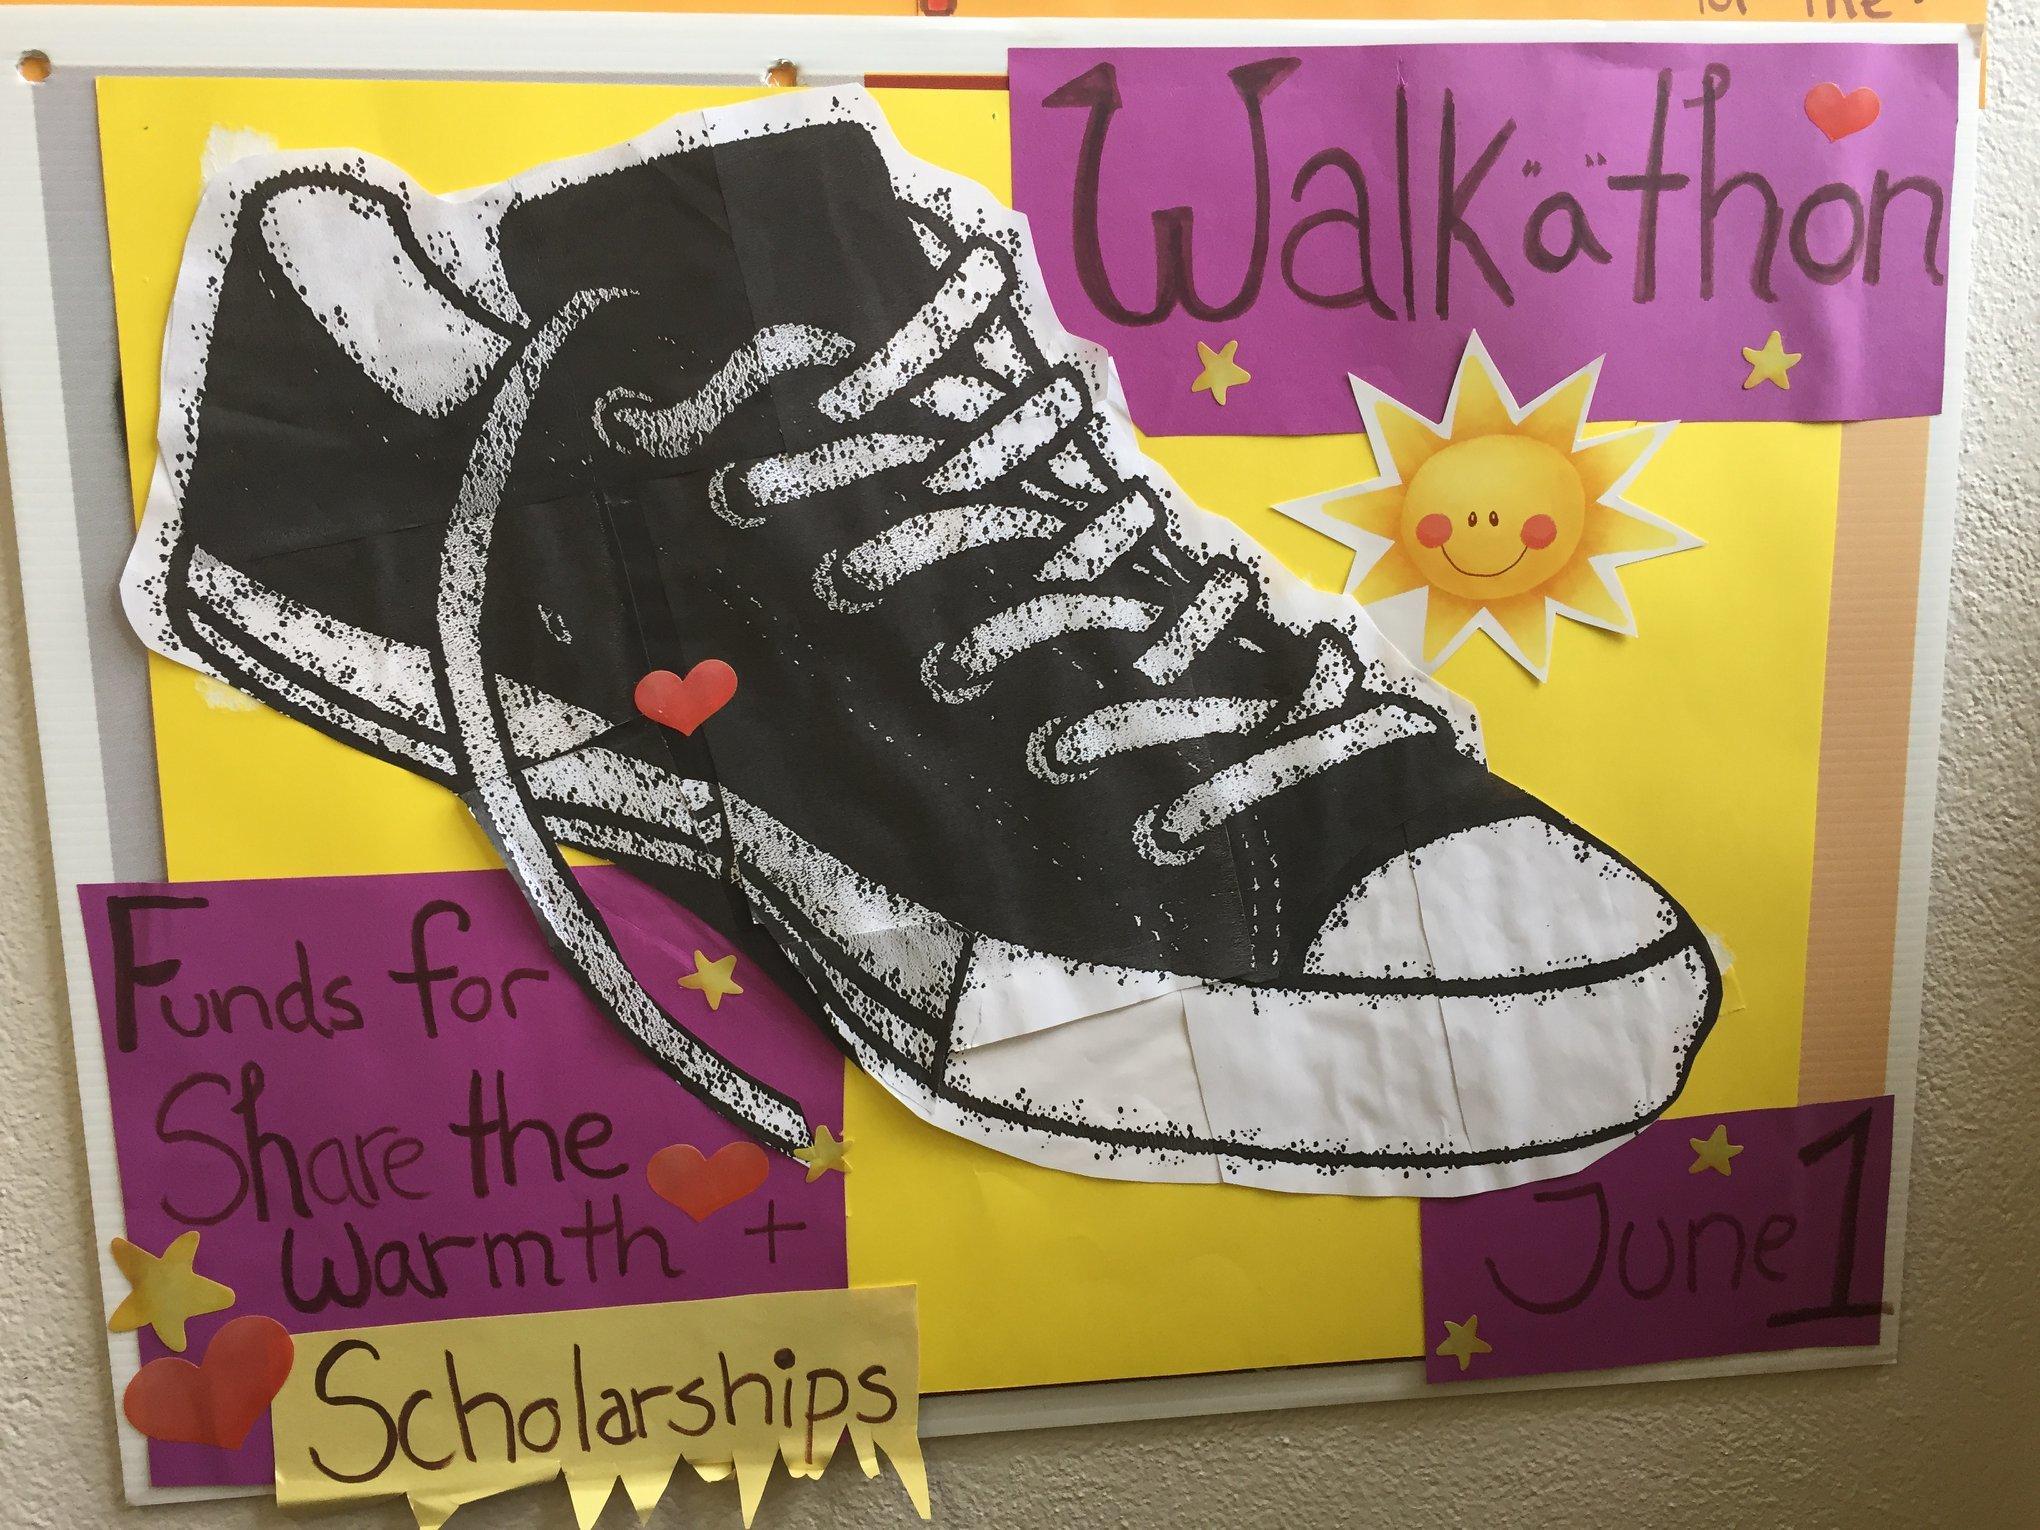 Share the Warmth Walkathon